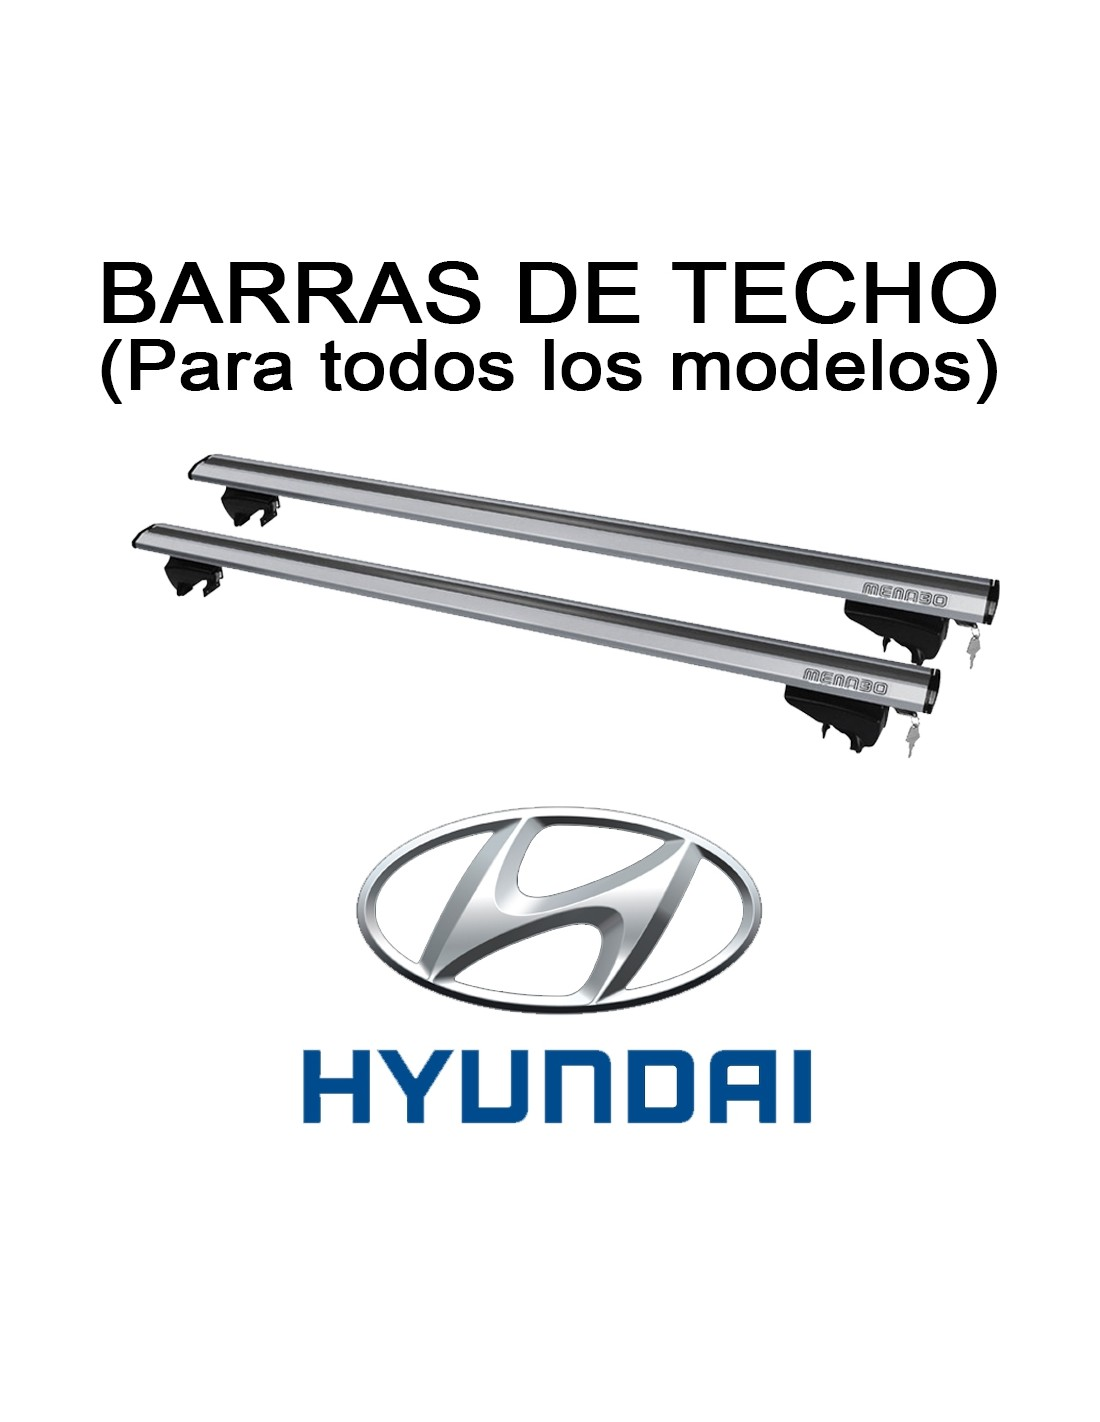 Desmontable Barra de remolque Witter Gancho de remolque para Hyundai i20 Hatchback//Escotilla 2014-2020